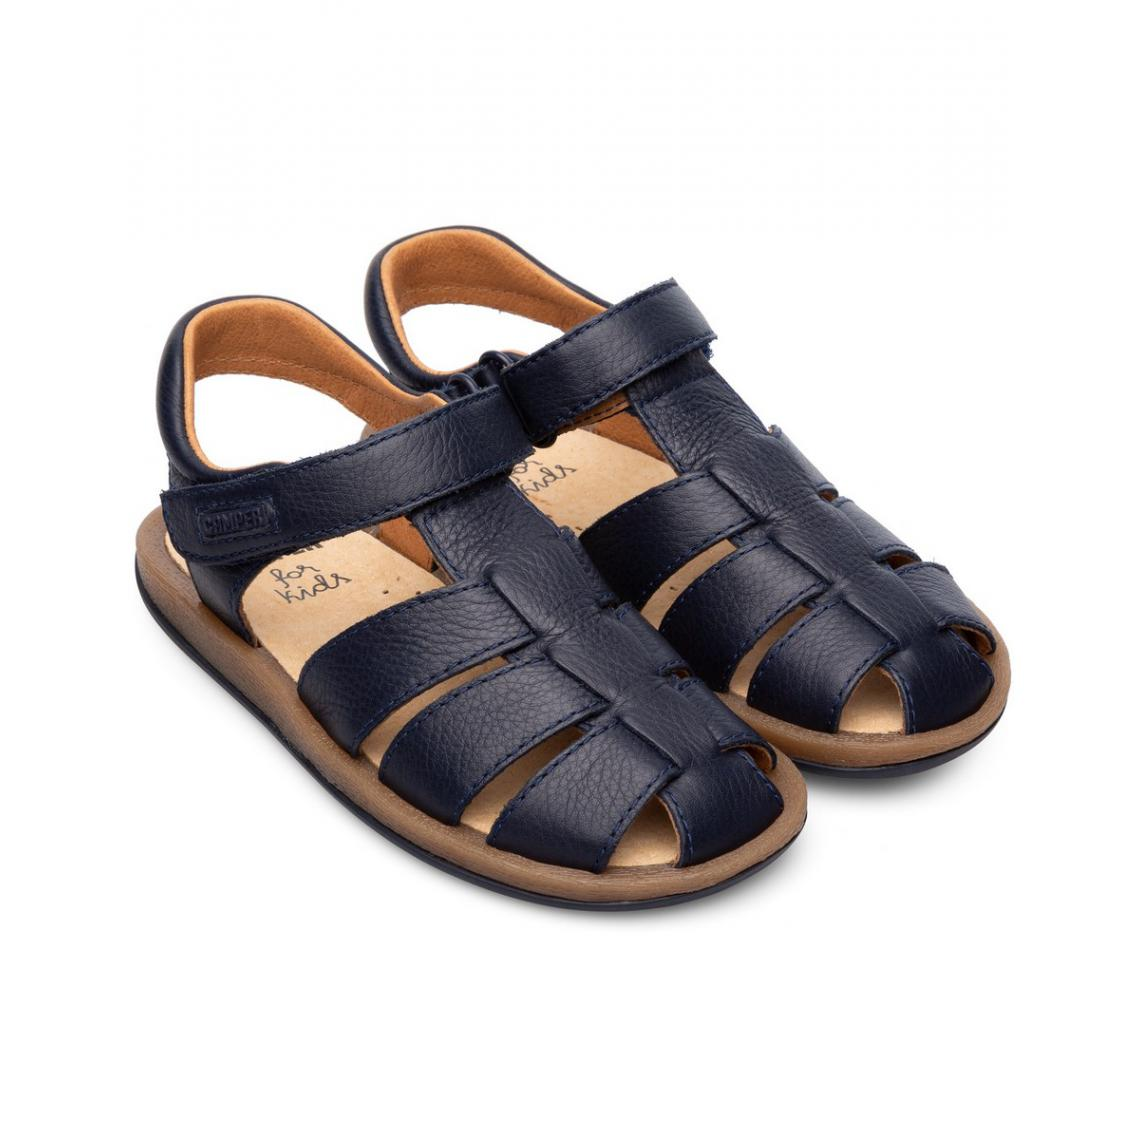 Sandales  Bicho bleu marine